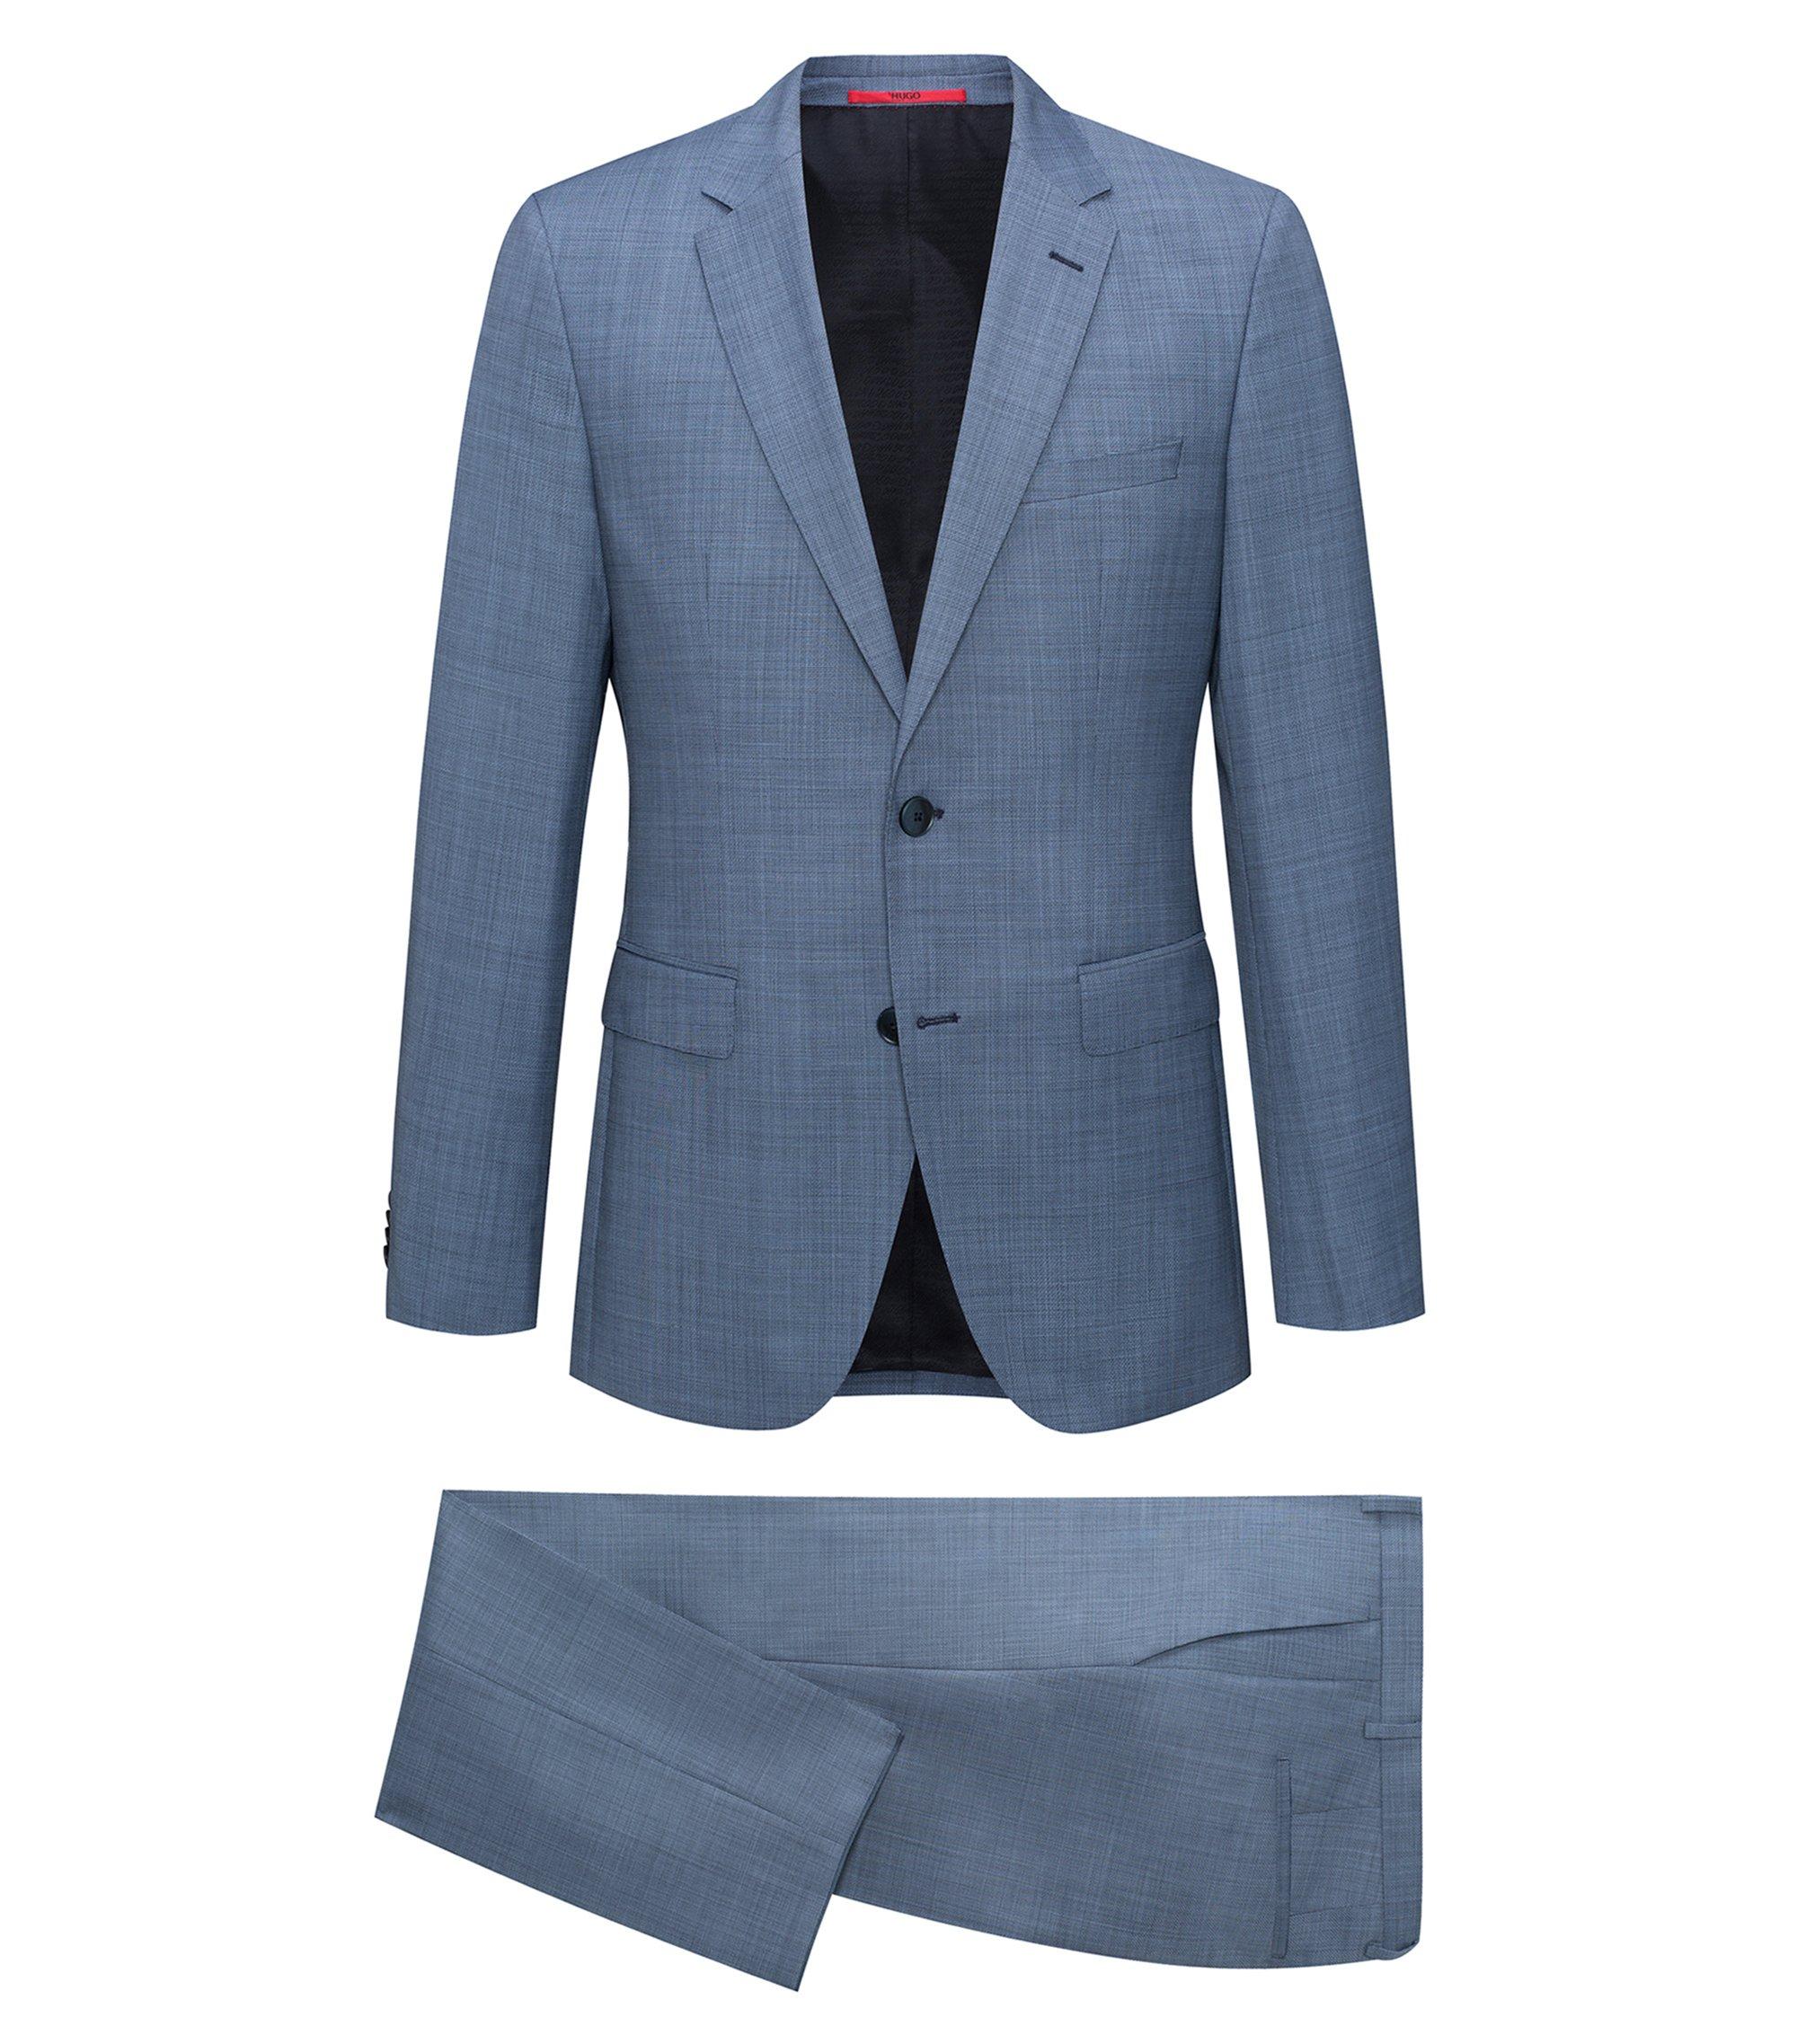 Gemusterter Regular-Fit Anzug aus Schurwoll-Mix, Dunkelblau